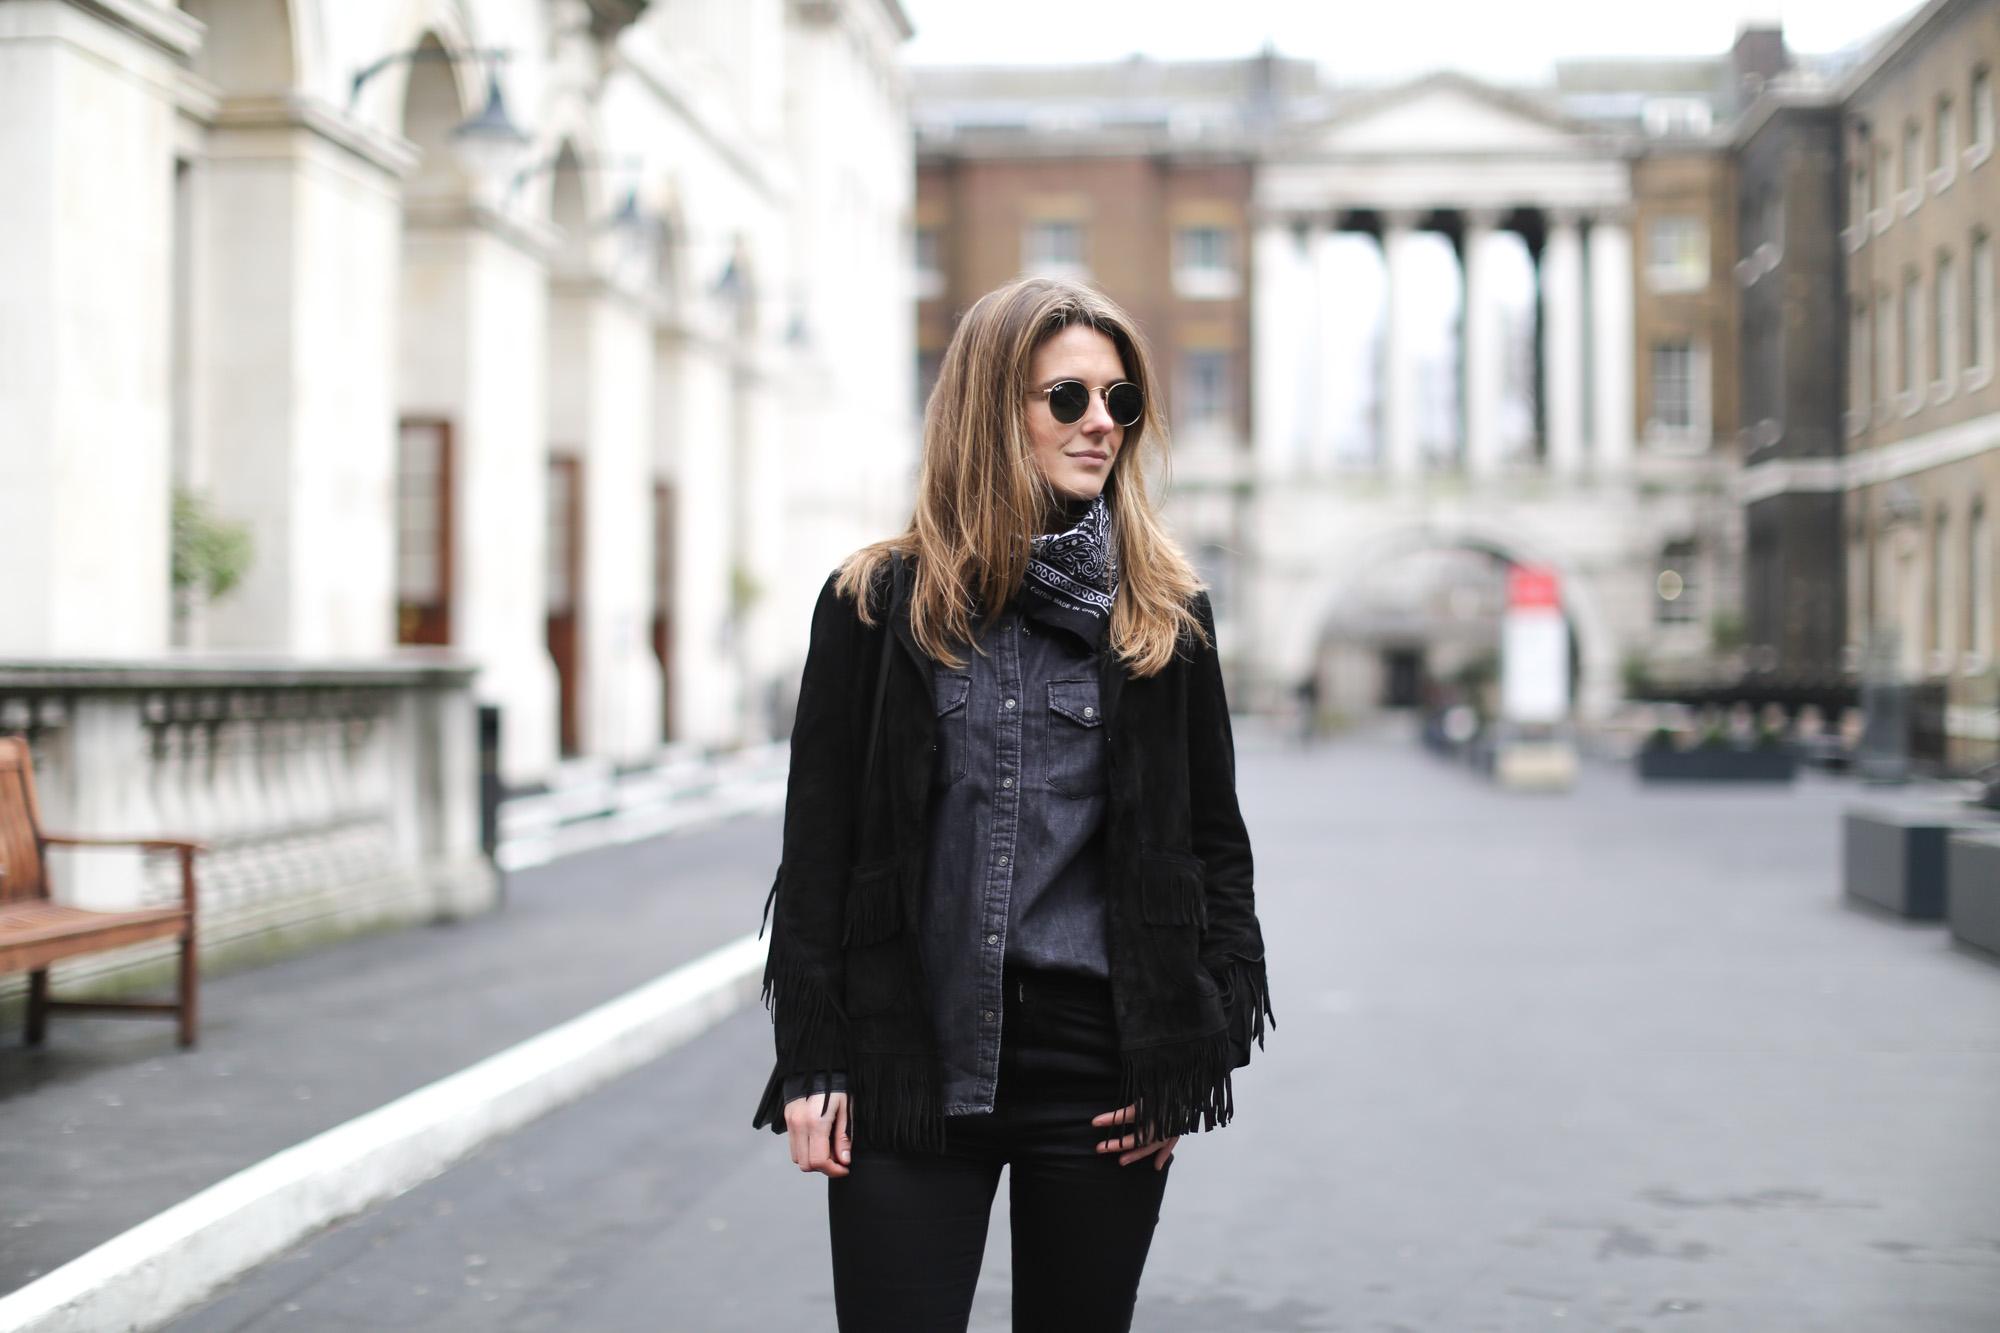 Clochet-streetstyle-lfw-london-fashion-week-maje-fringed-suede-jacket-cowboy-boots-5